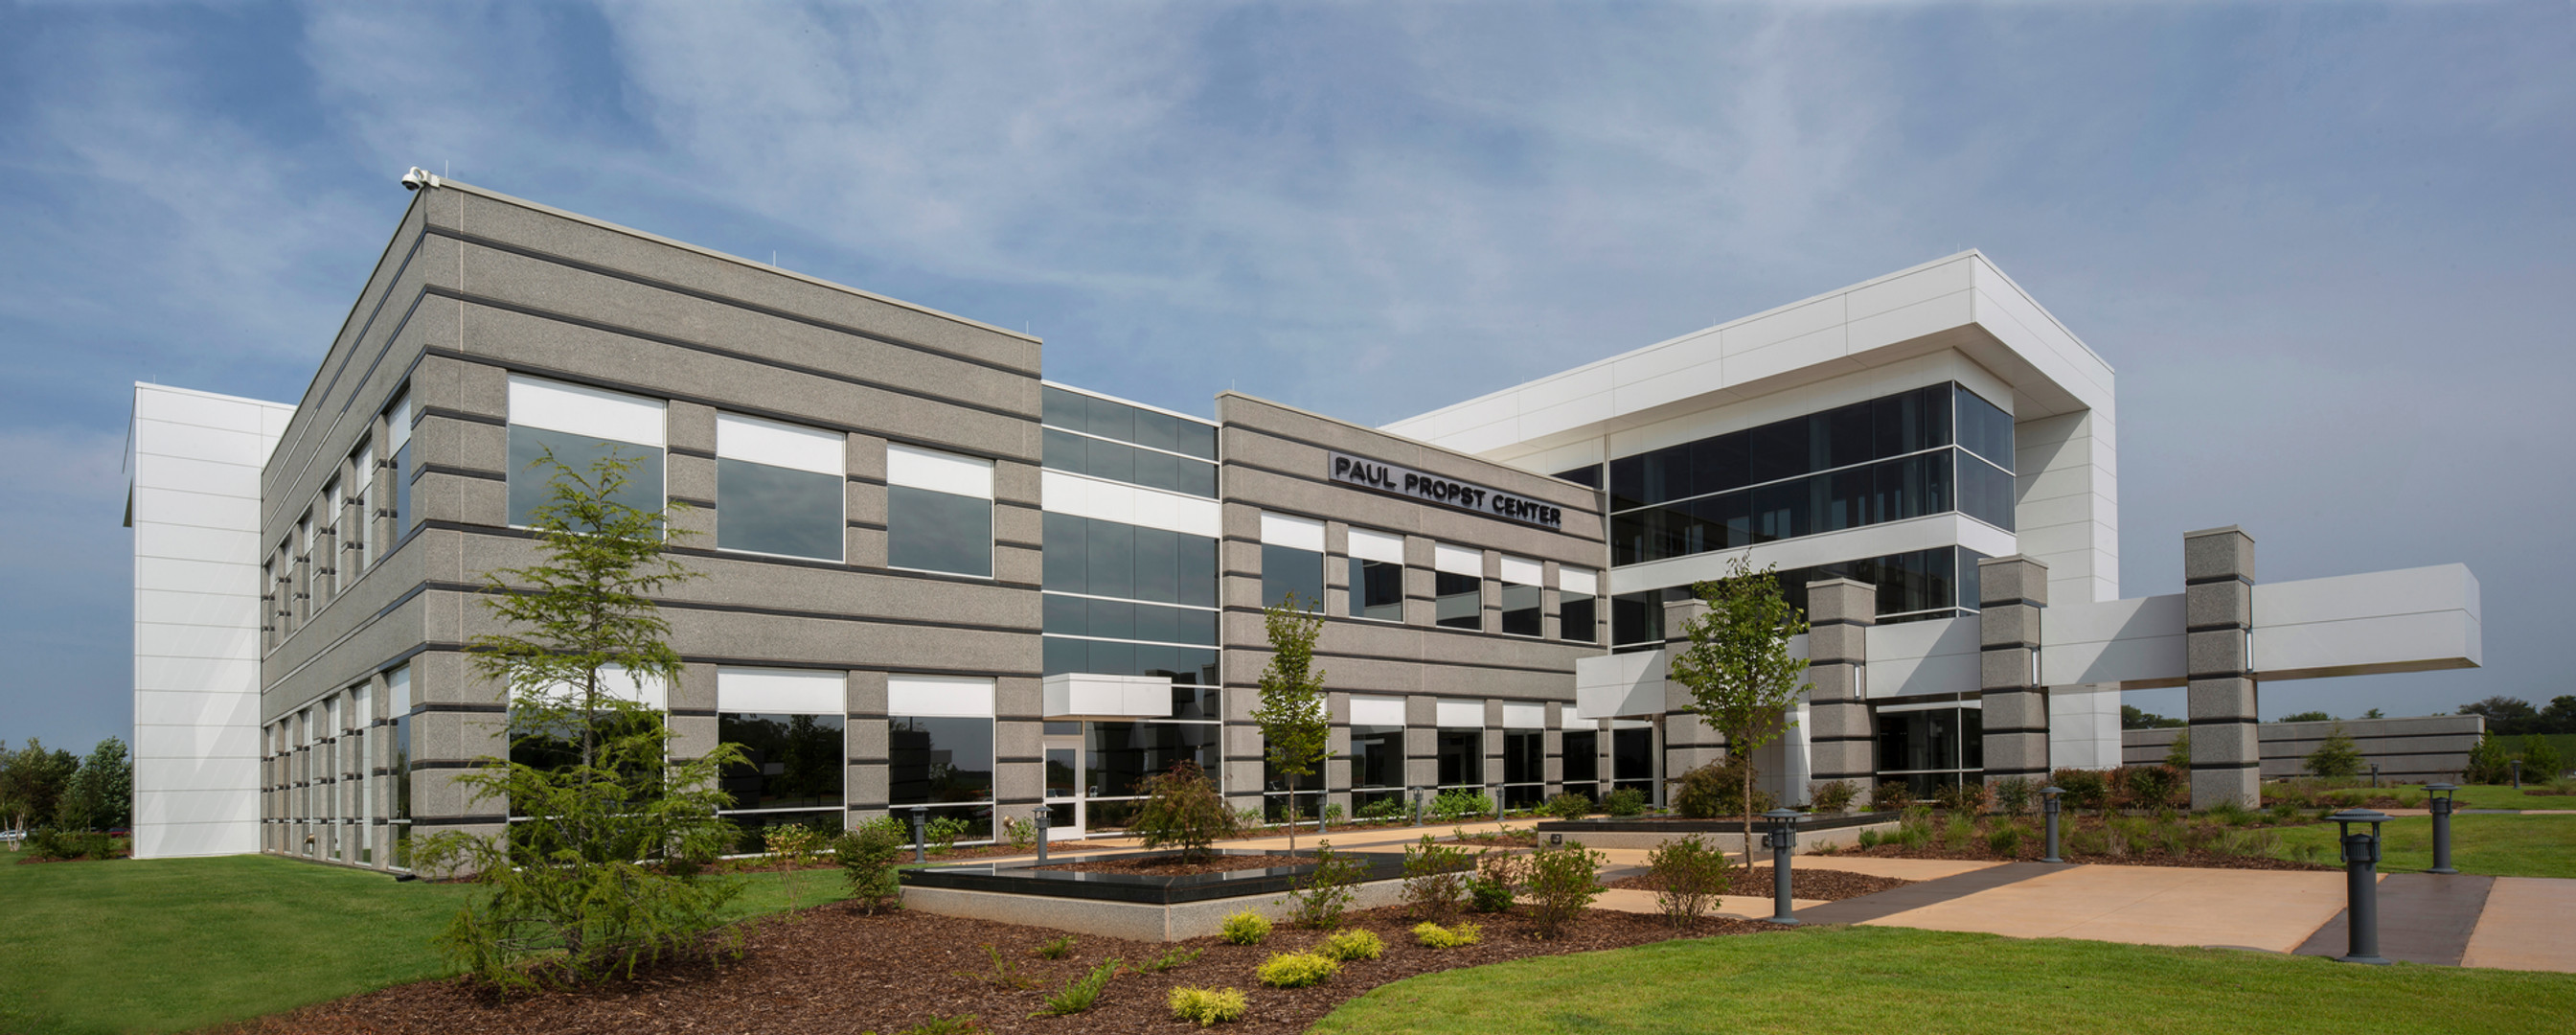 HudsonAlpha Institute of Biotechnology Paul Propst Center